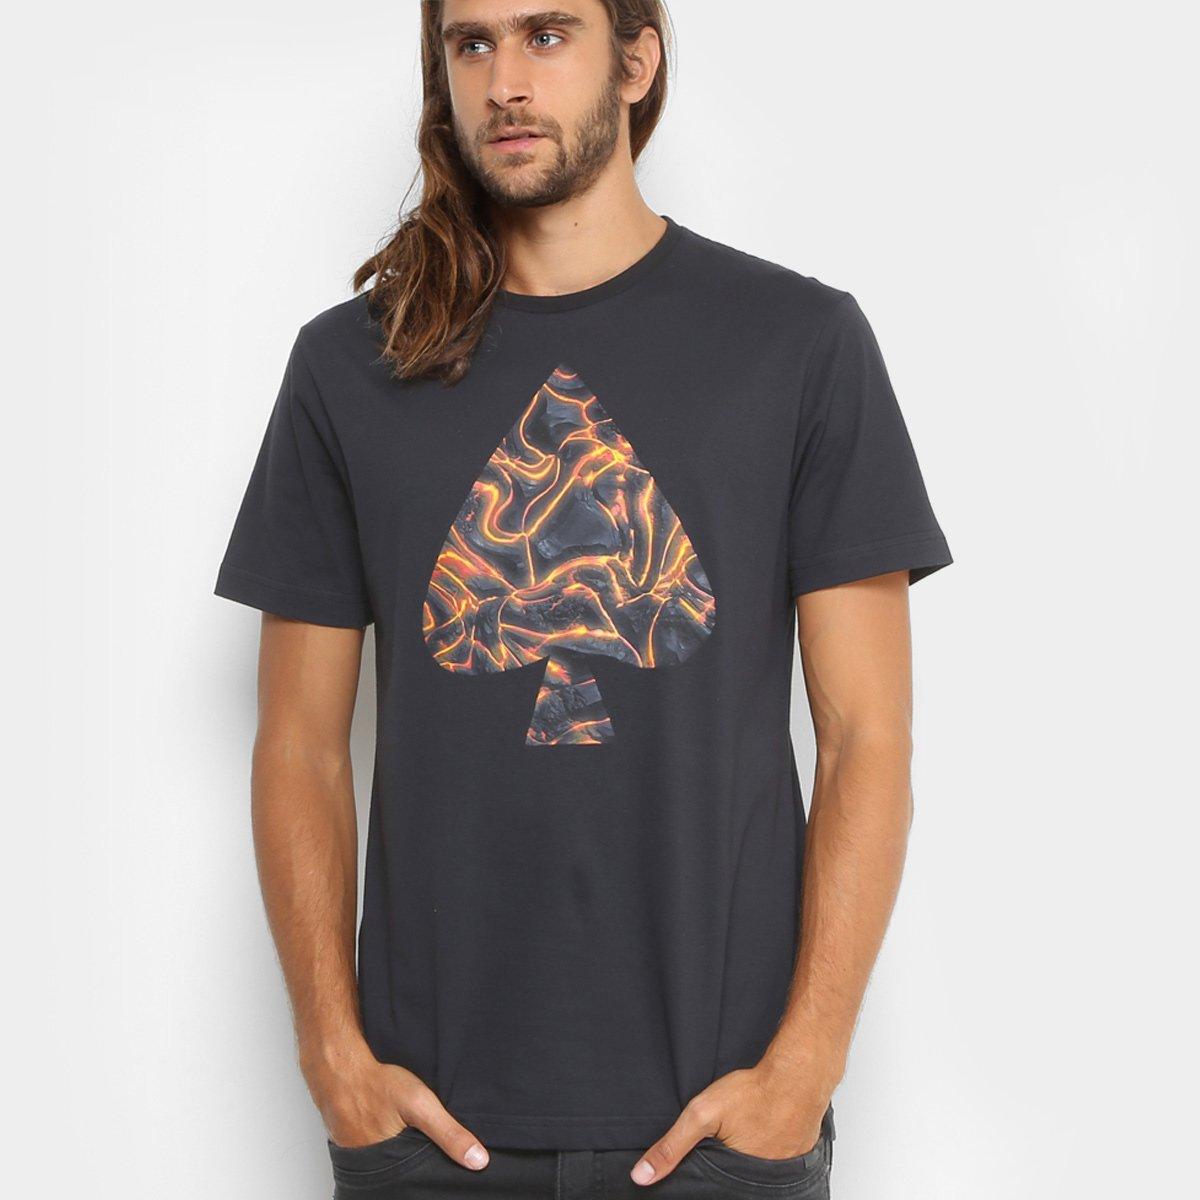 8d77a8f63bd97 Camiseta MCD Regular Vulcano Masculina - Compre Agora